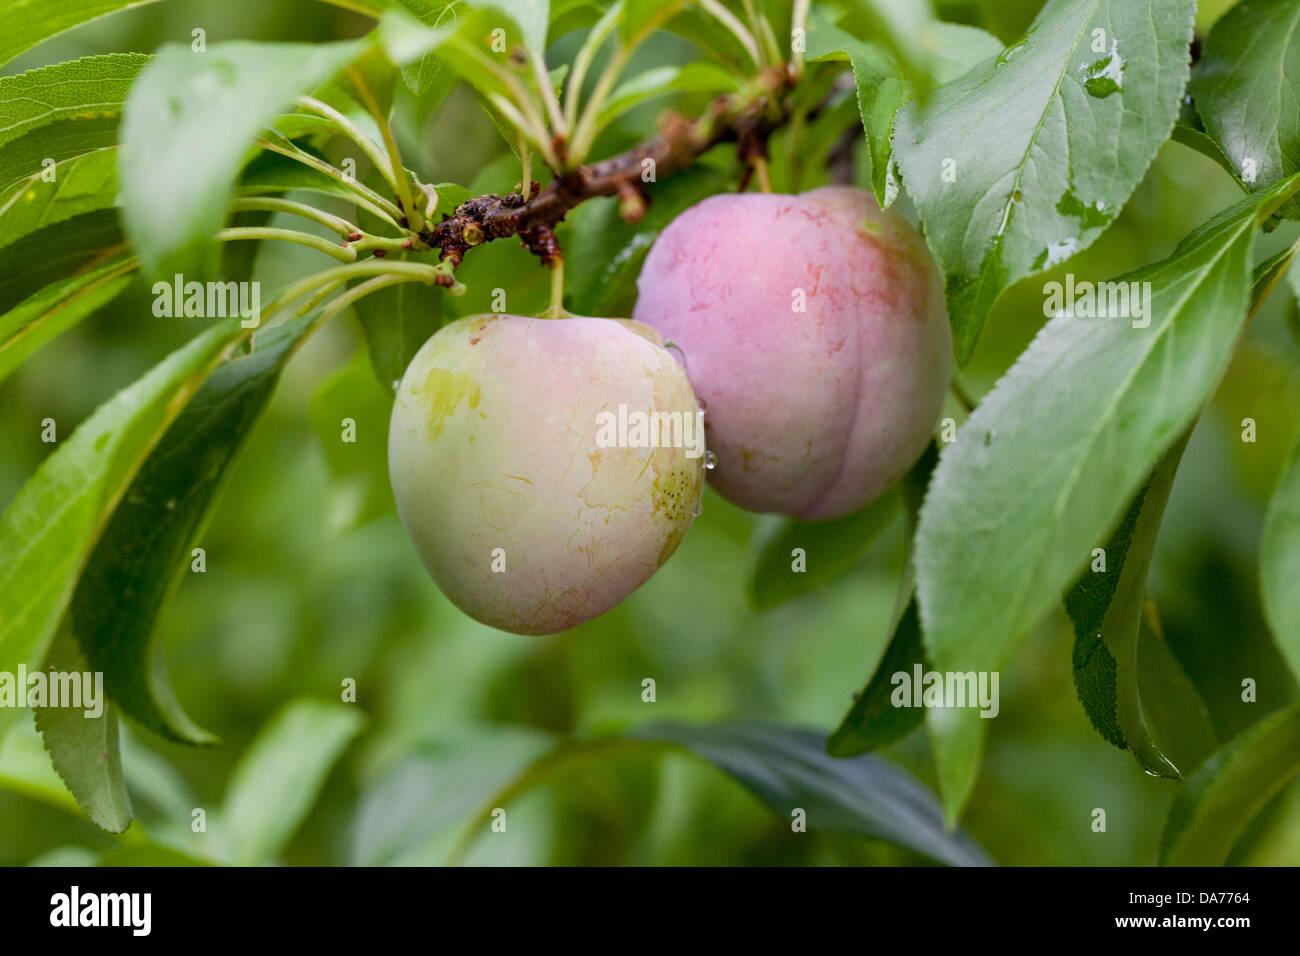 Japanische Pflaumen auf Ast (Prunus Salicina) Stockbild